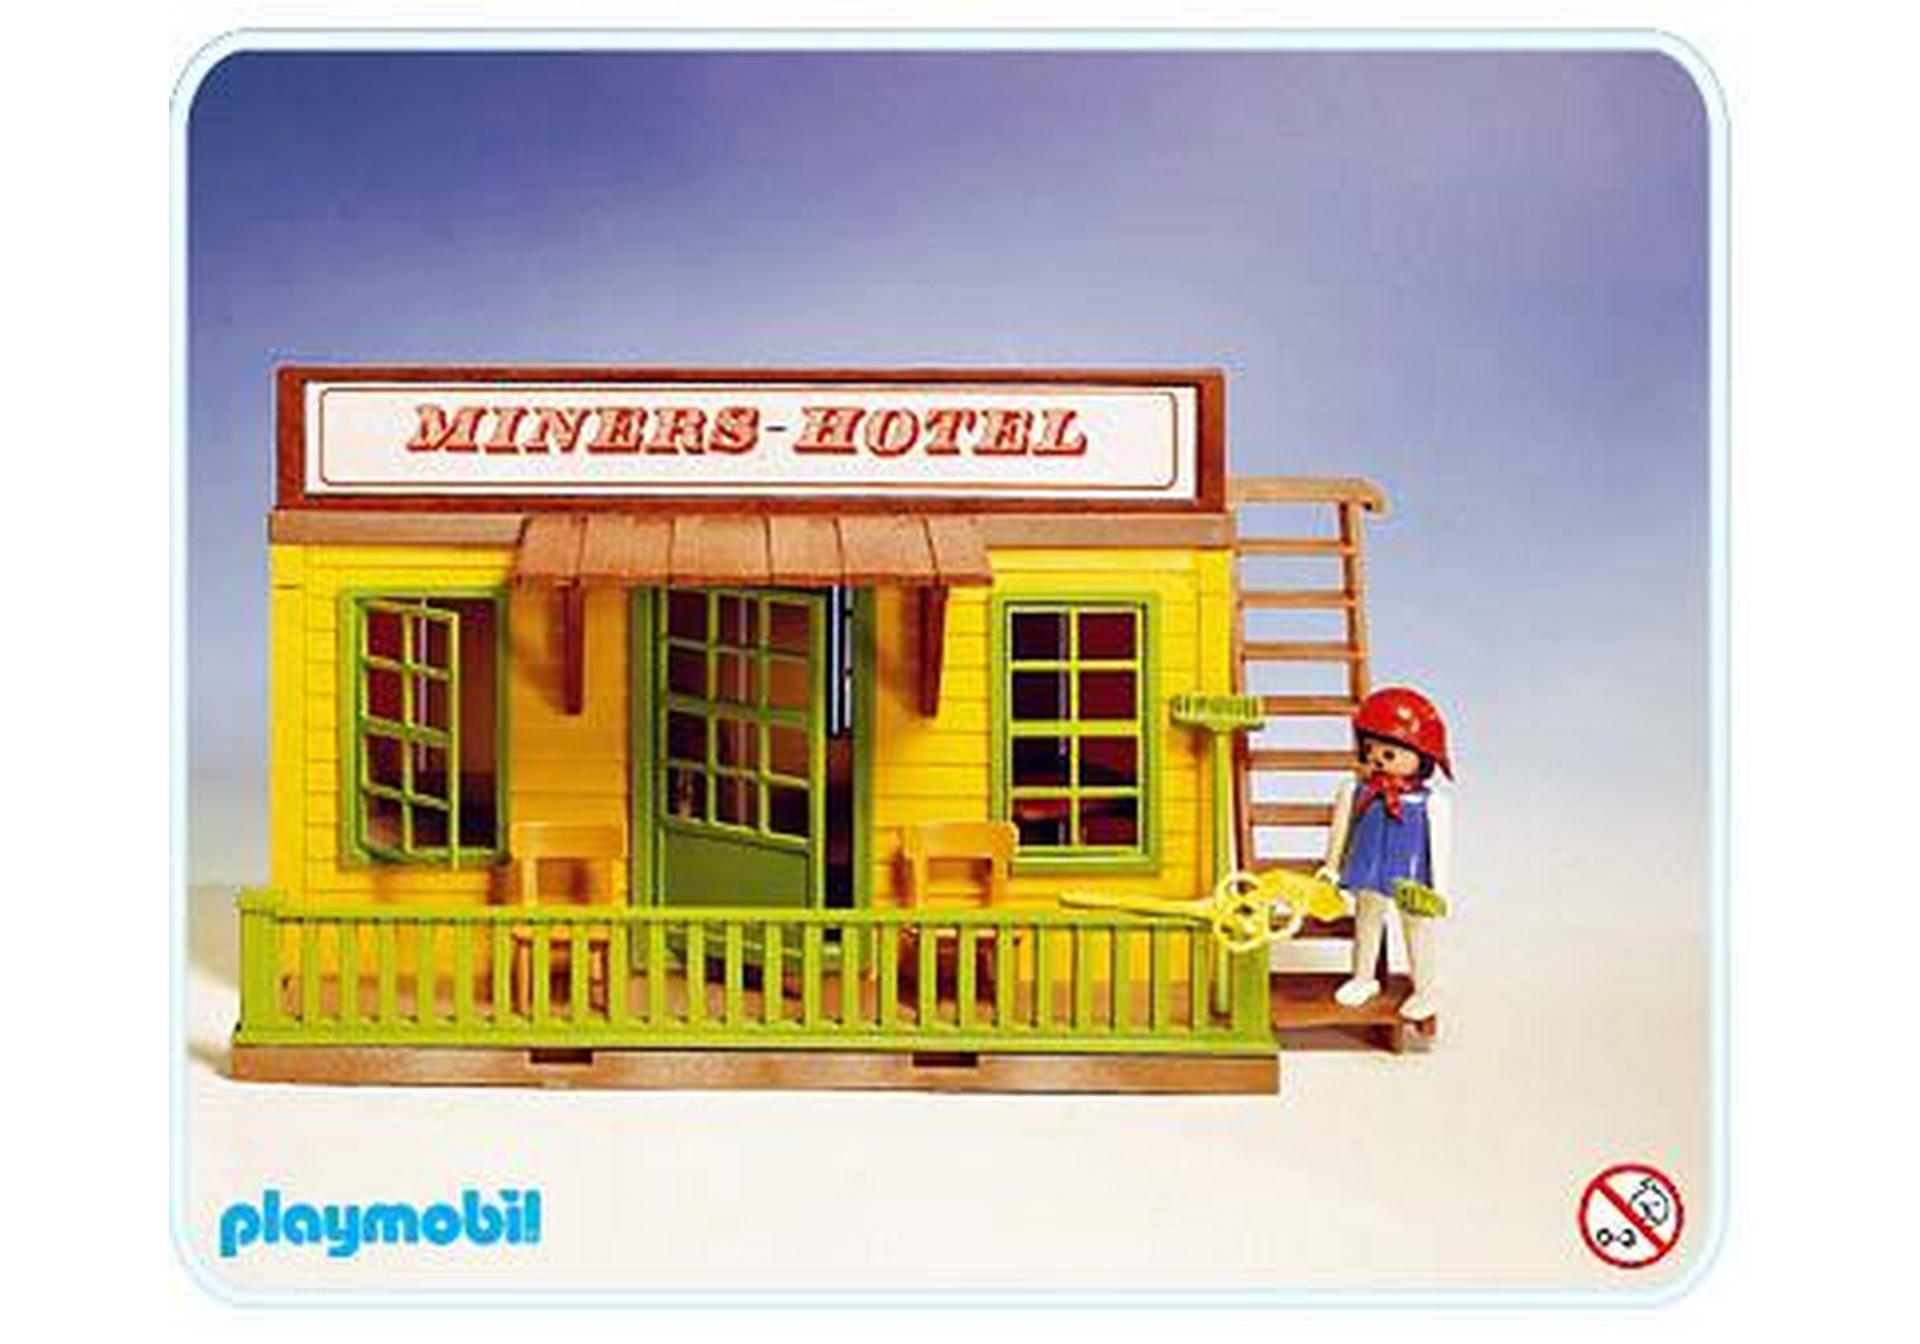 Hotel 3426 a playmobil deutschland for Jugendzimmer playmobil